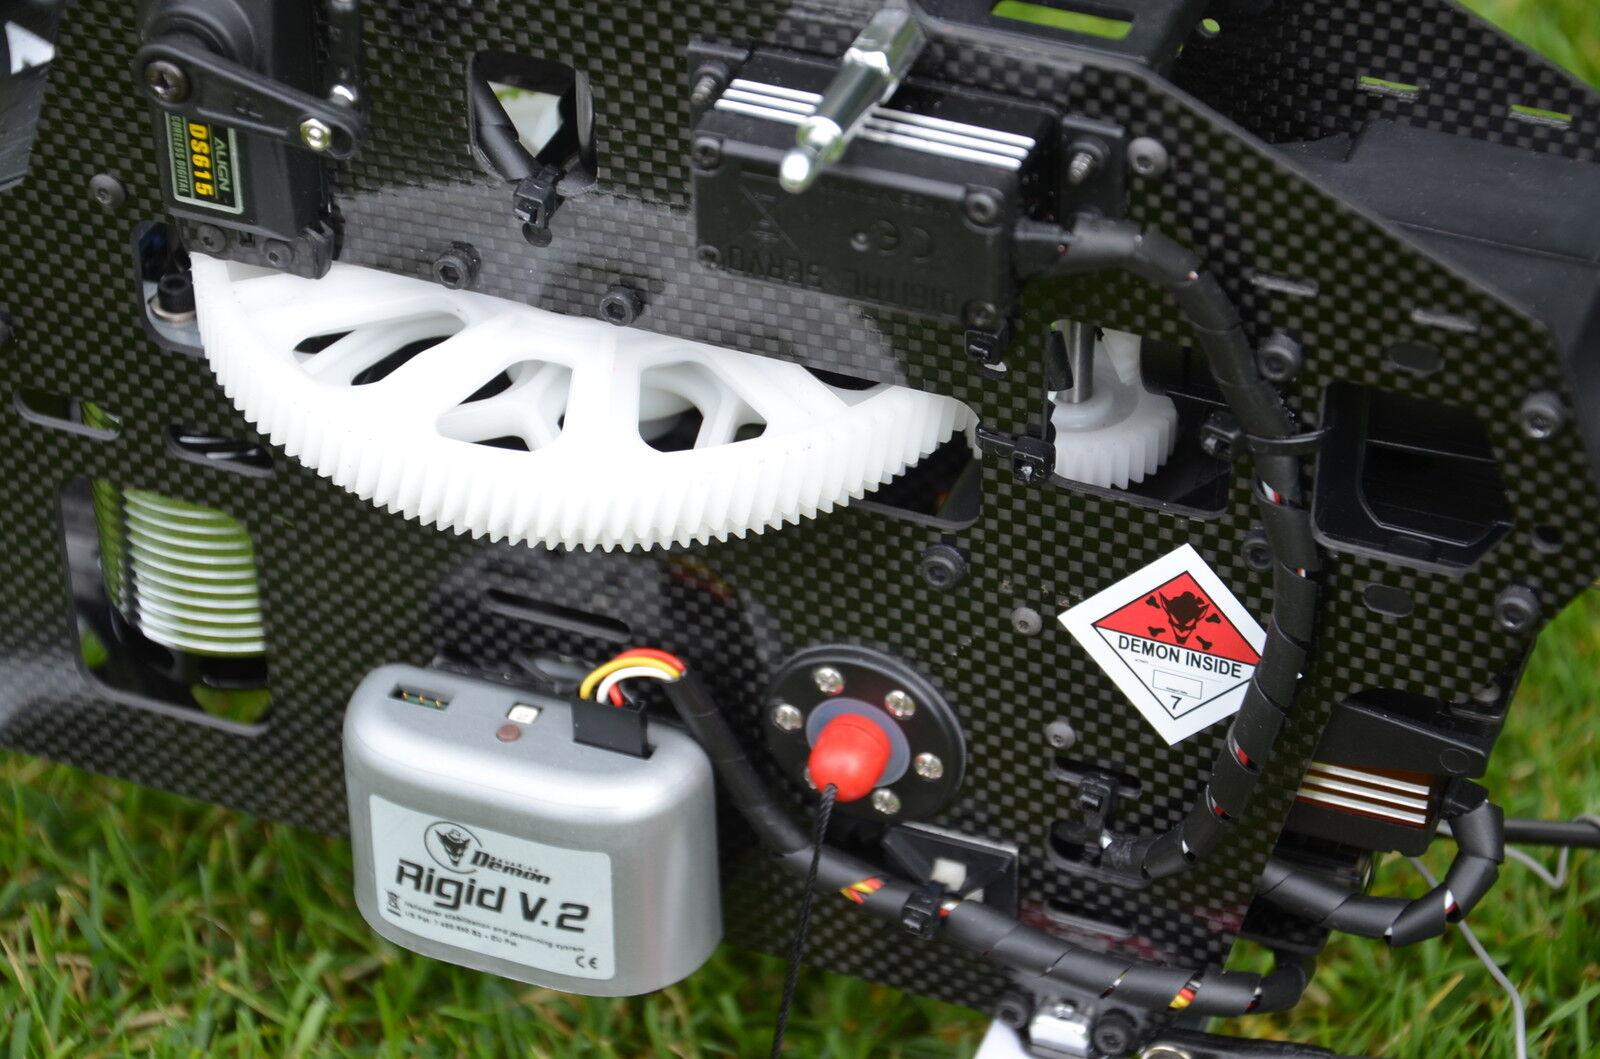 Helicommand Rigid V2 3-achs Flybarless System of Autopilot Bavarian Demon